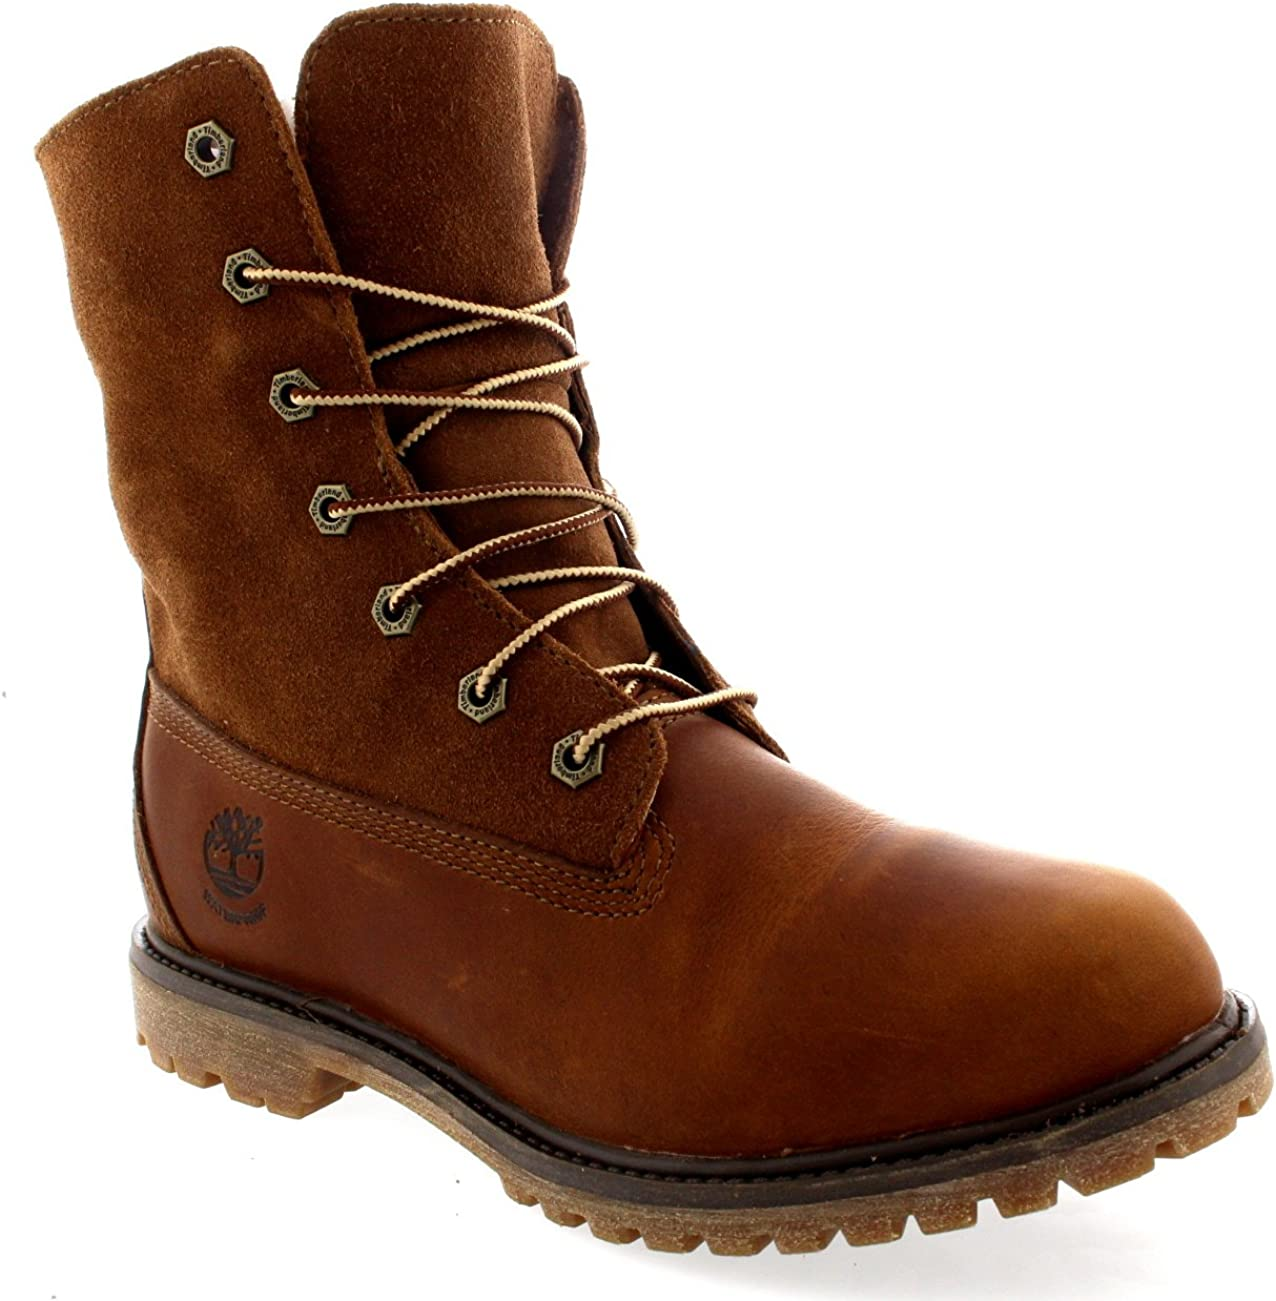 Timberland Womens Authentic Teddy Fleece Rain Snow Leather Winter Boots